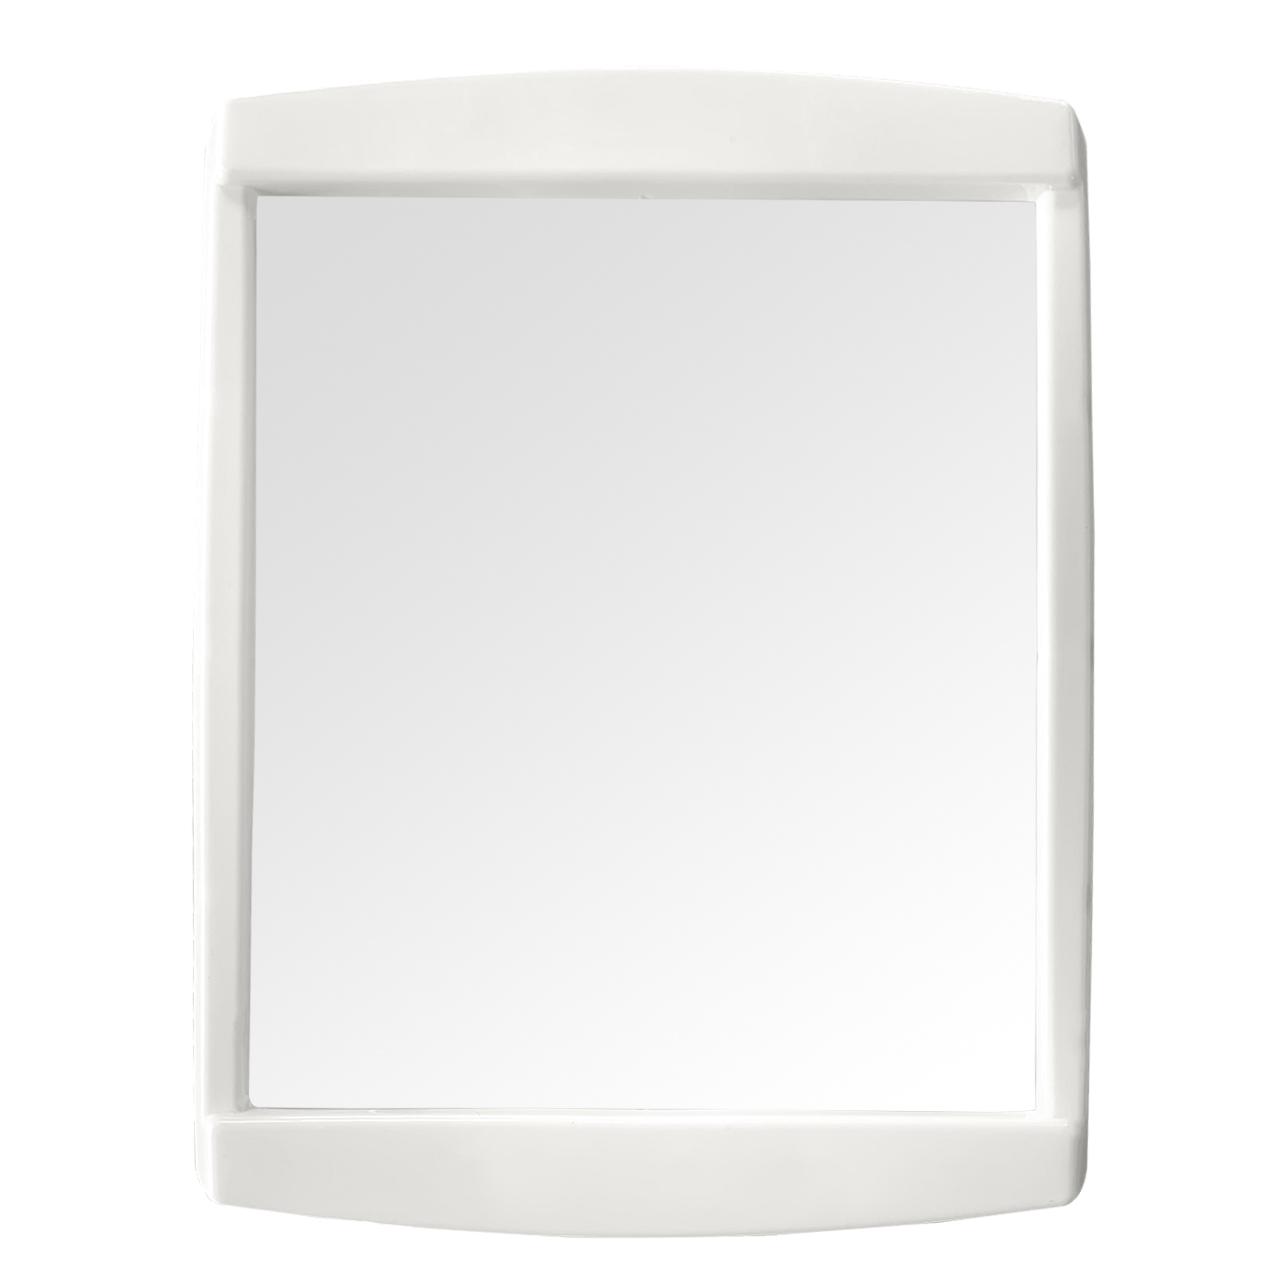 آینه الف پلاستیک مدل آرا-2